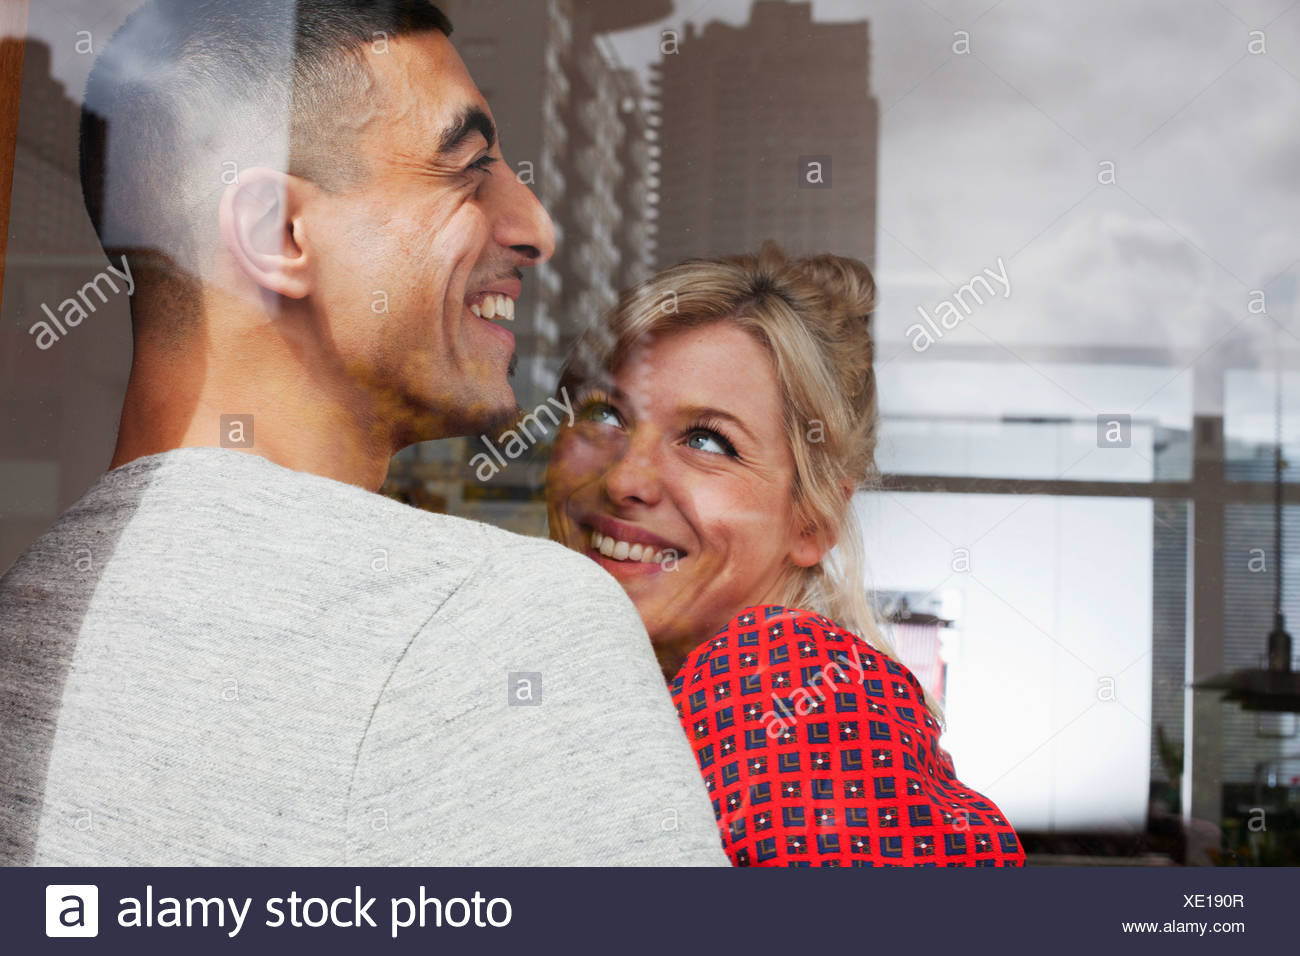 Young couple through window Stock Photo